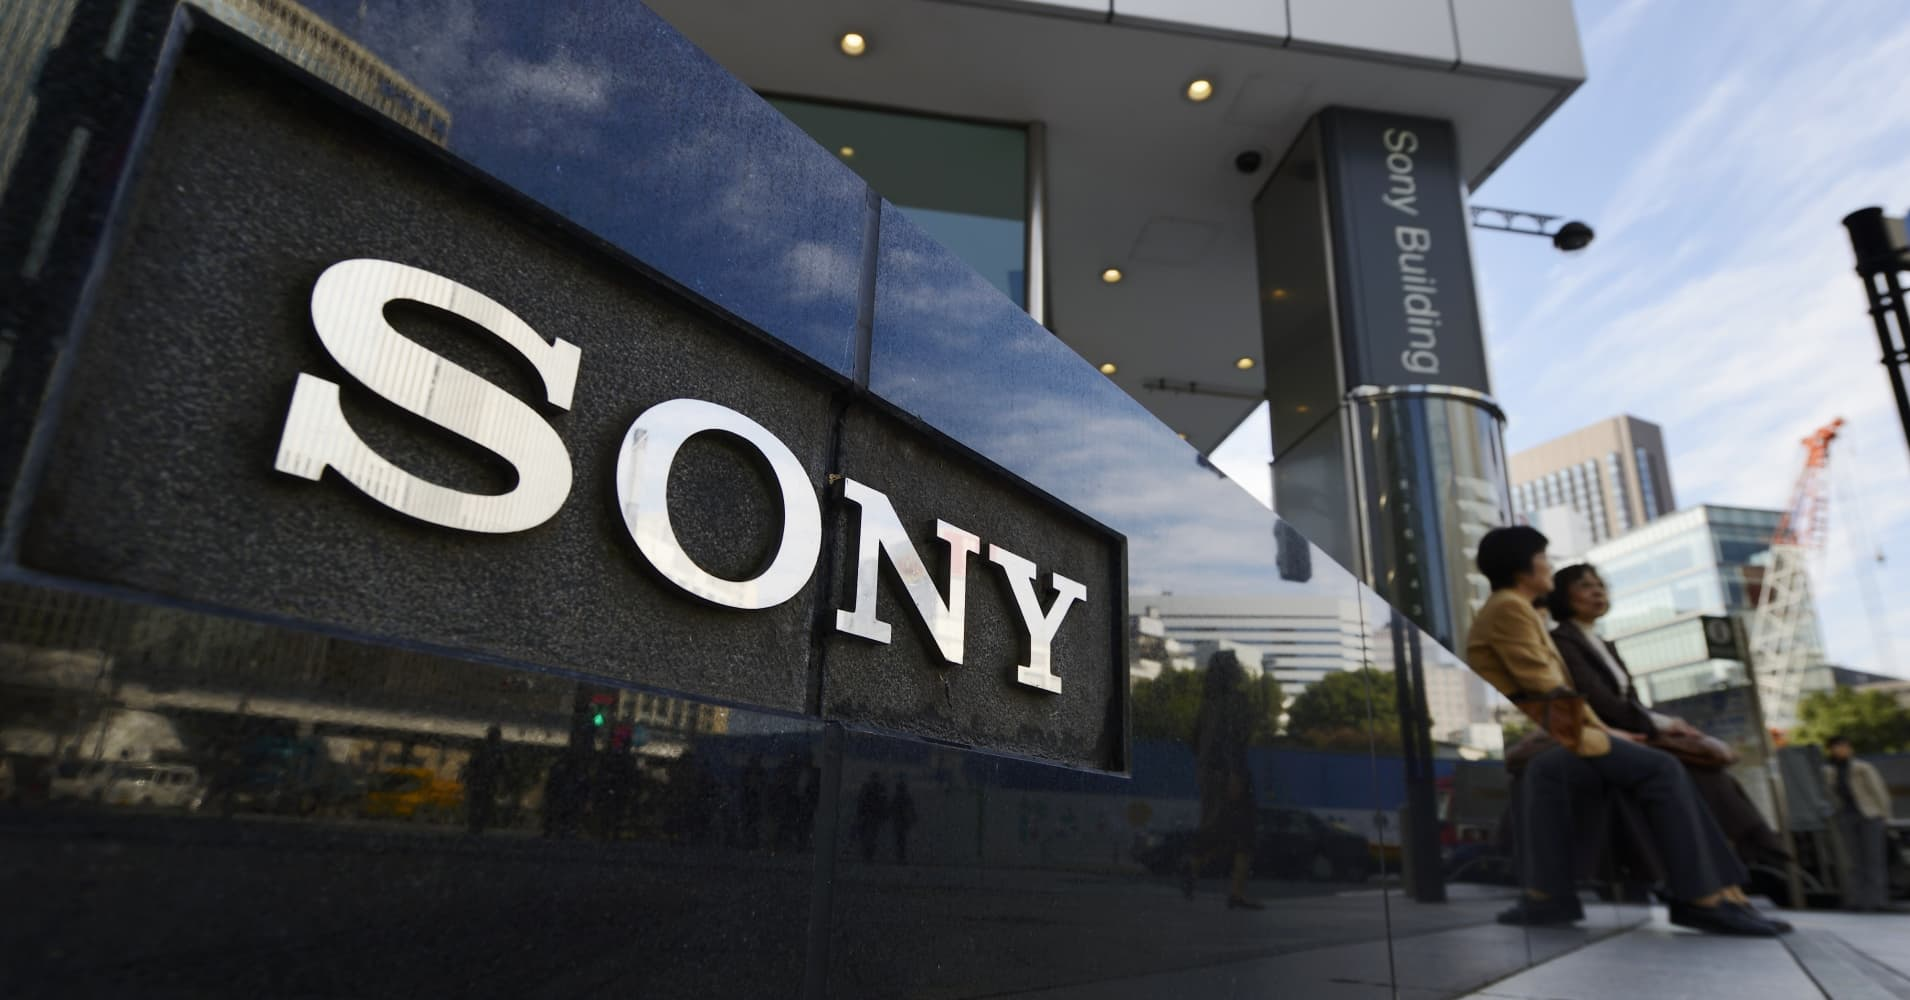 Sony service